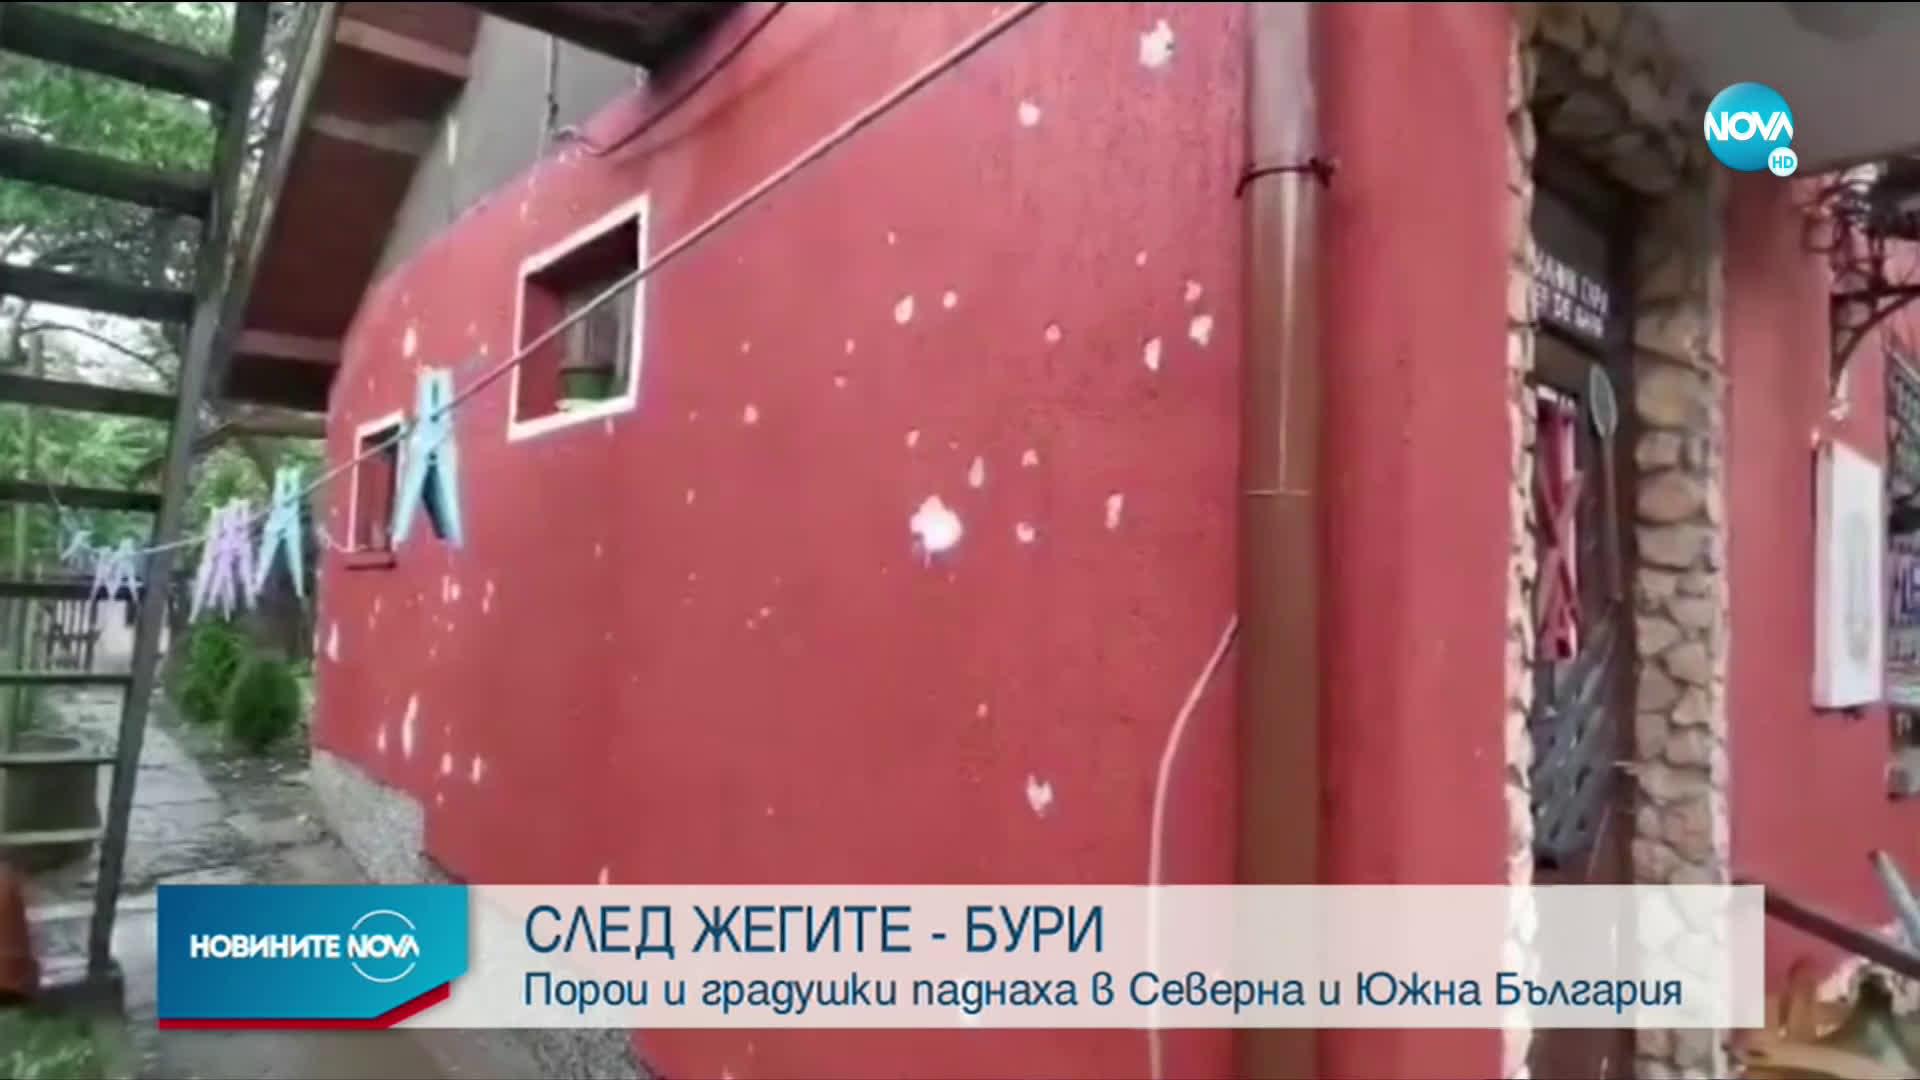 Бури и градушки връхлетяха части от България